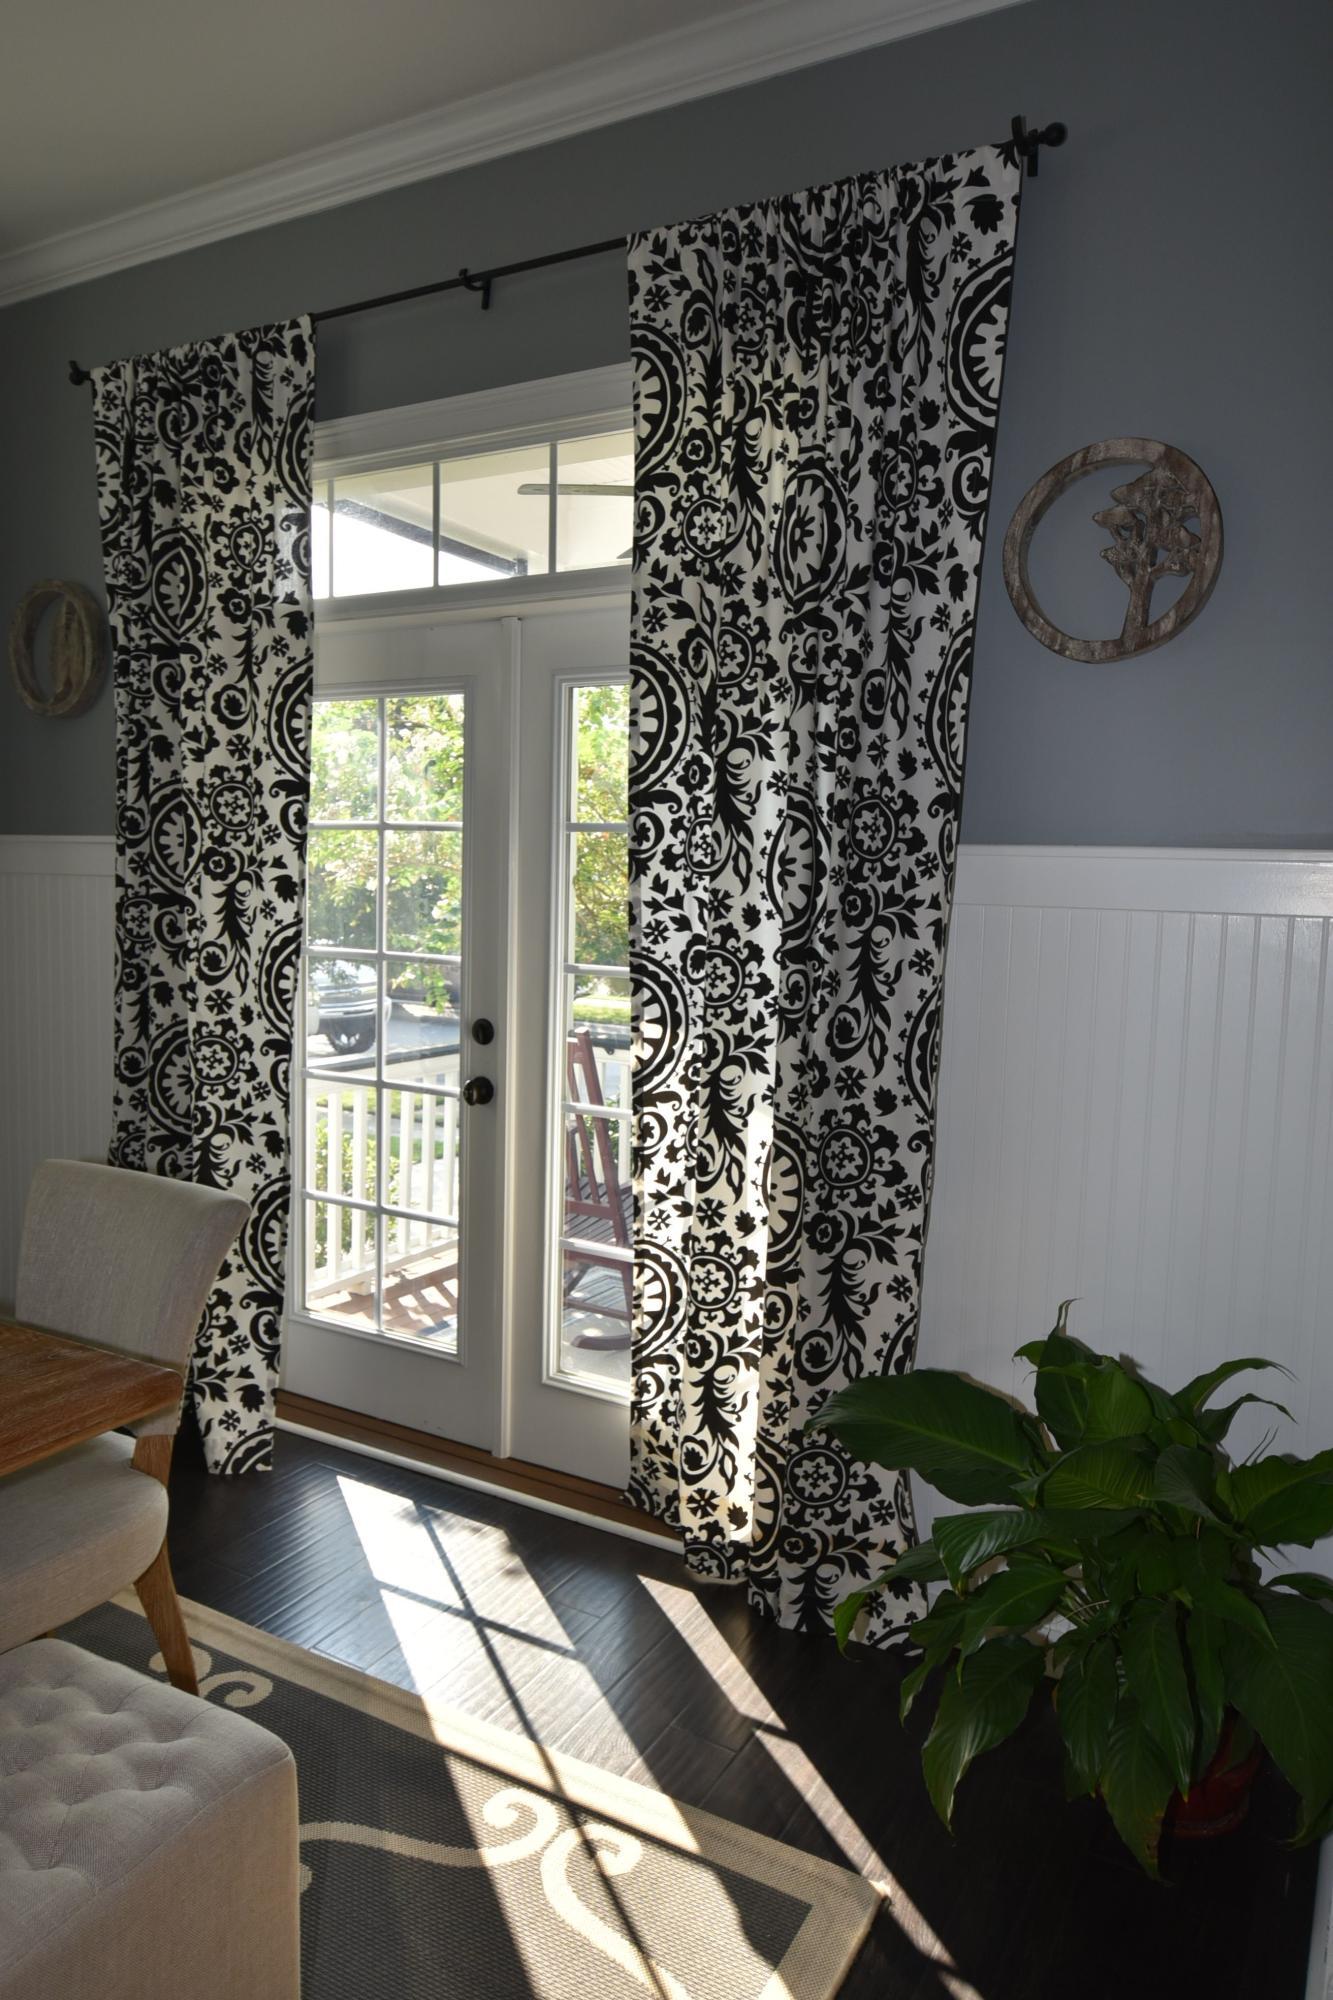 Carolina Park Homes For Sale - 1451 Crane Creek, Mount Pleasant, SC - 33